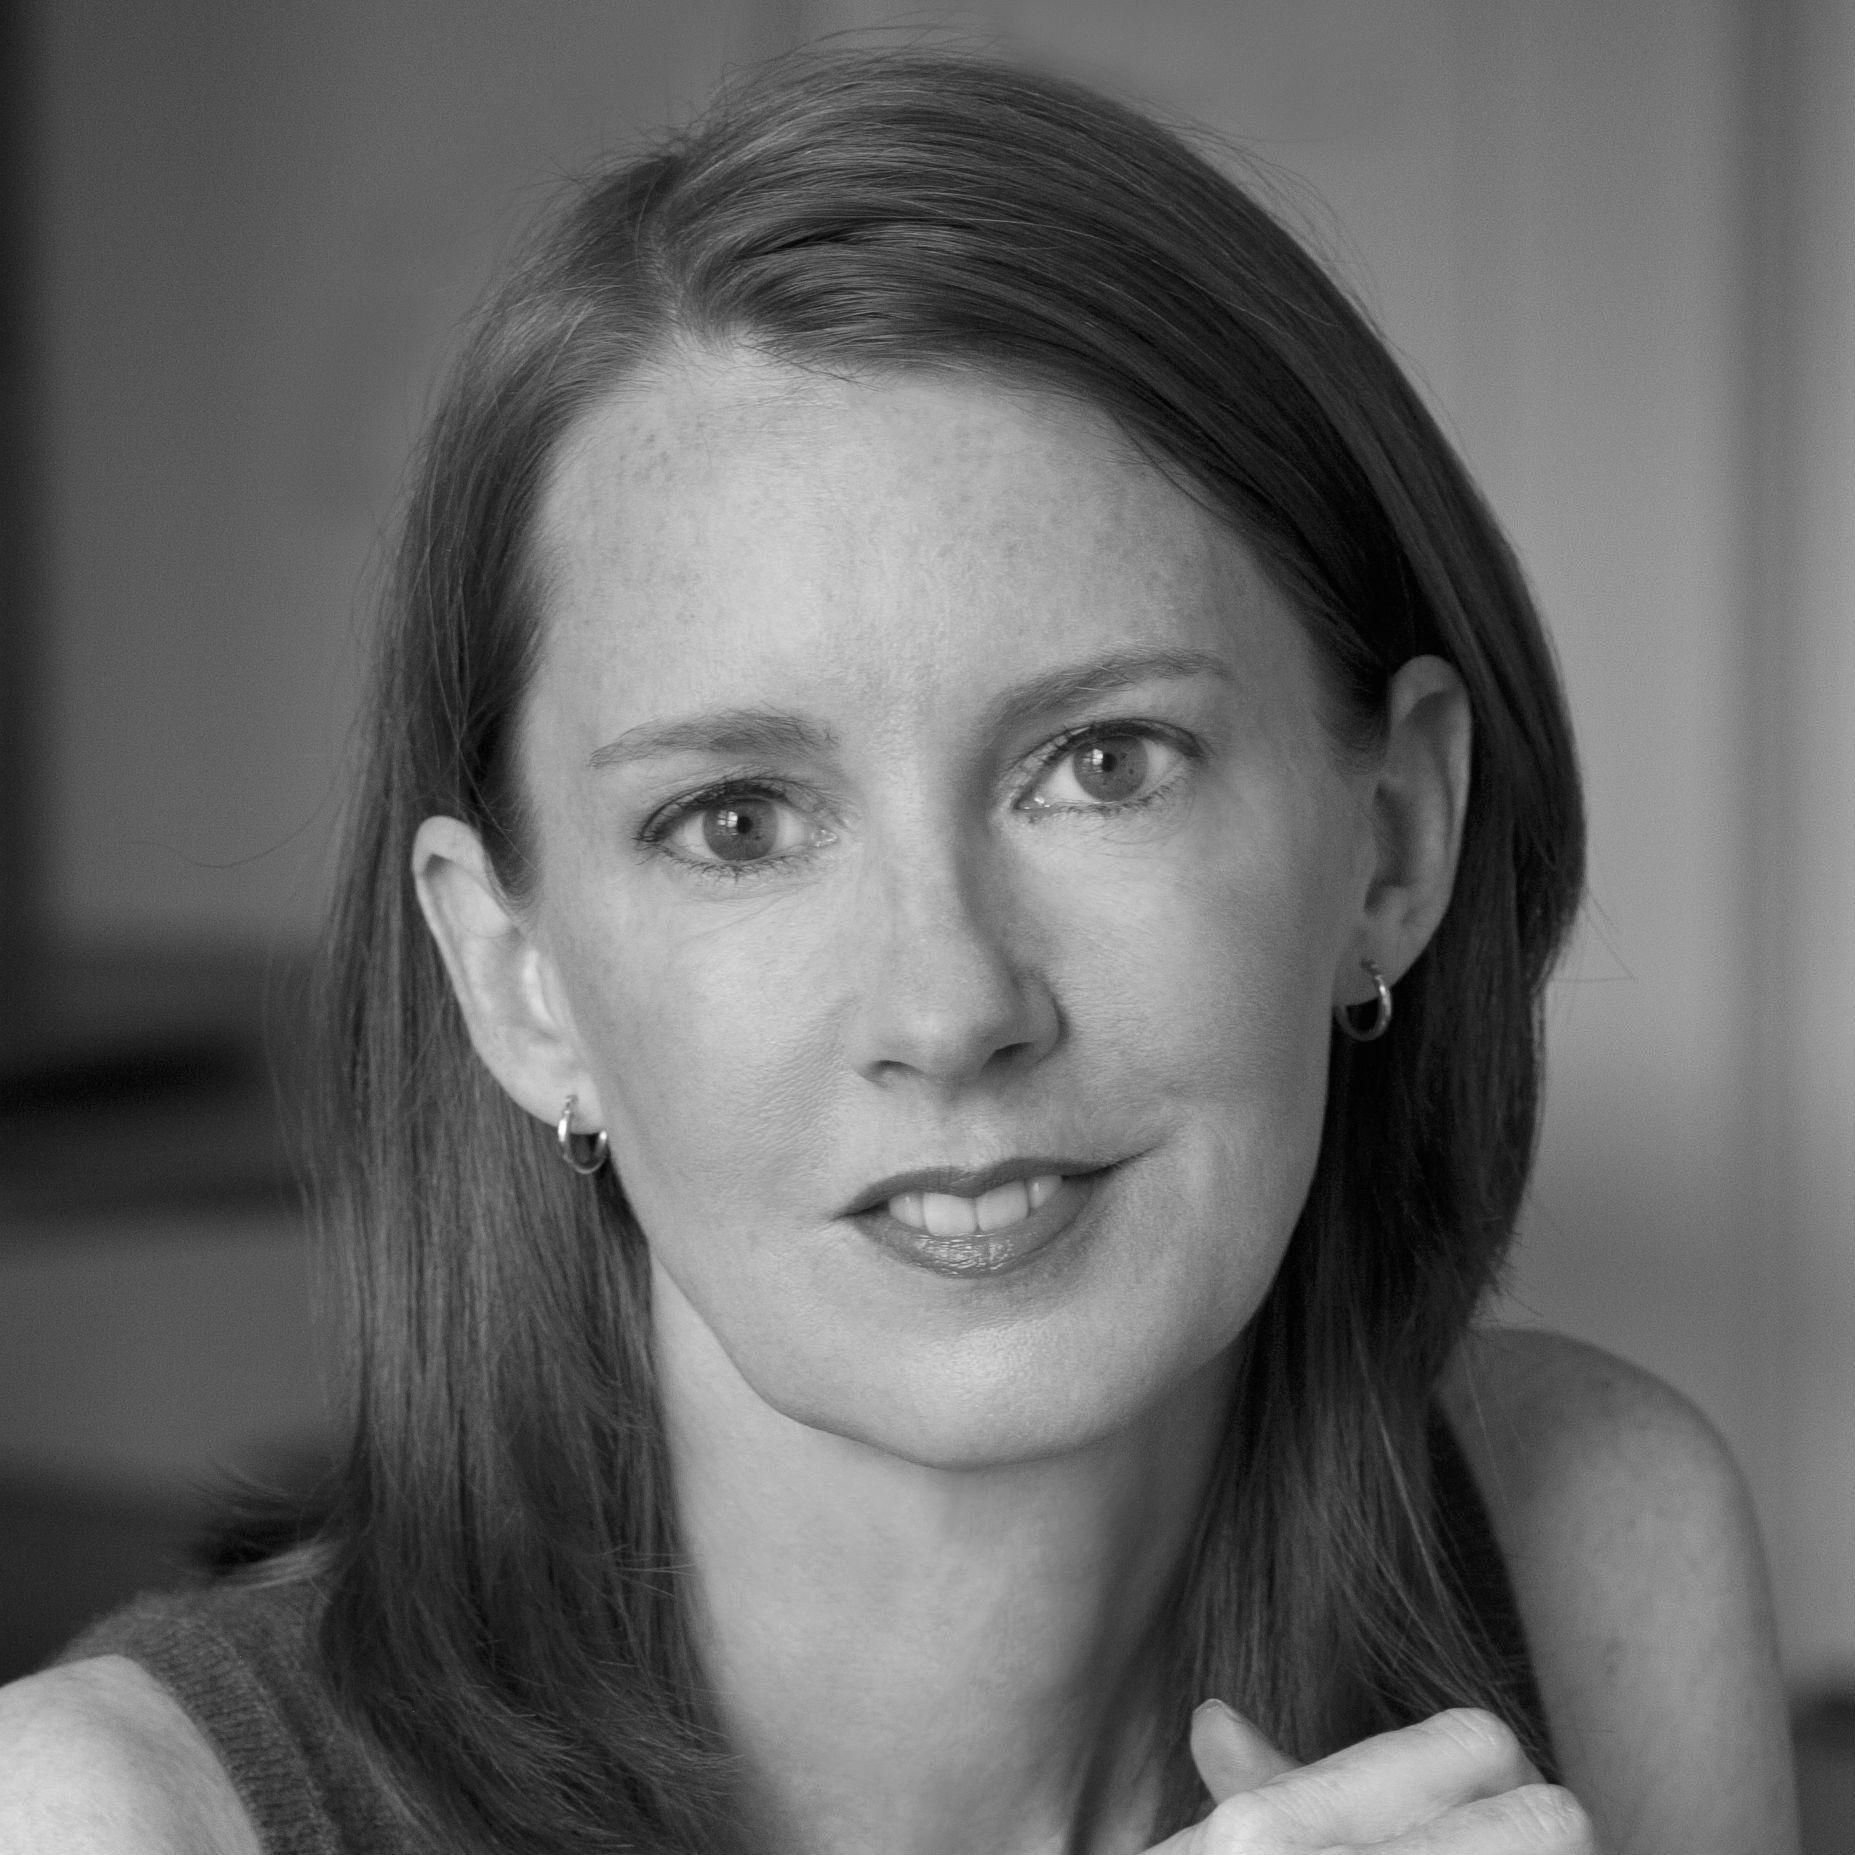 Gretchen Rubin Headshot